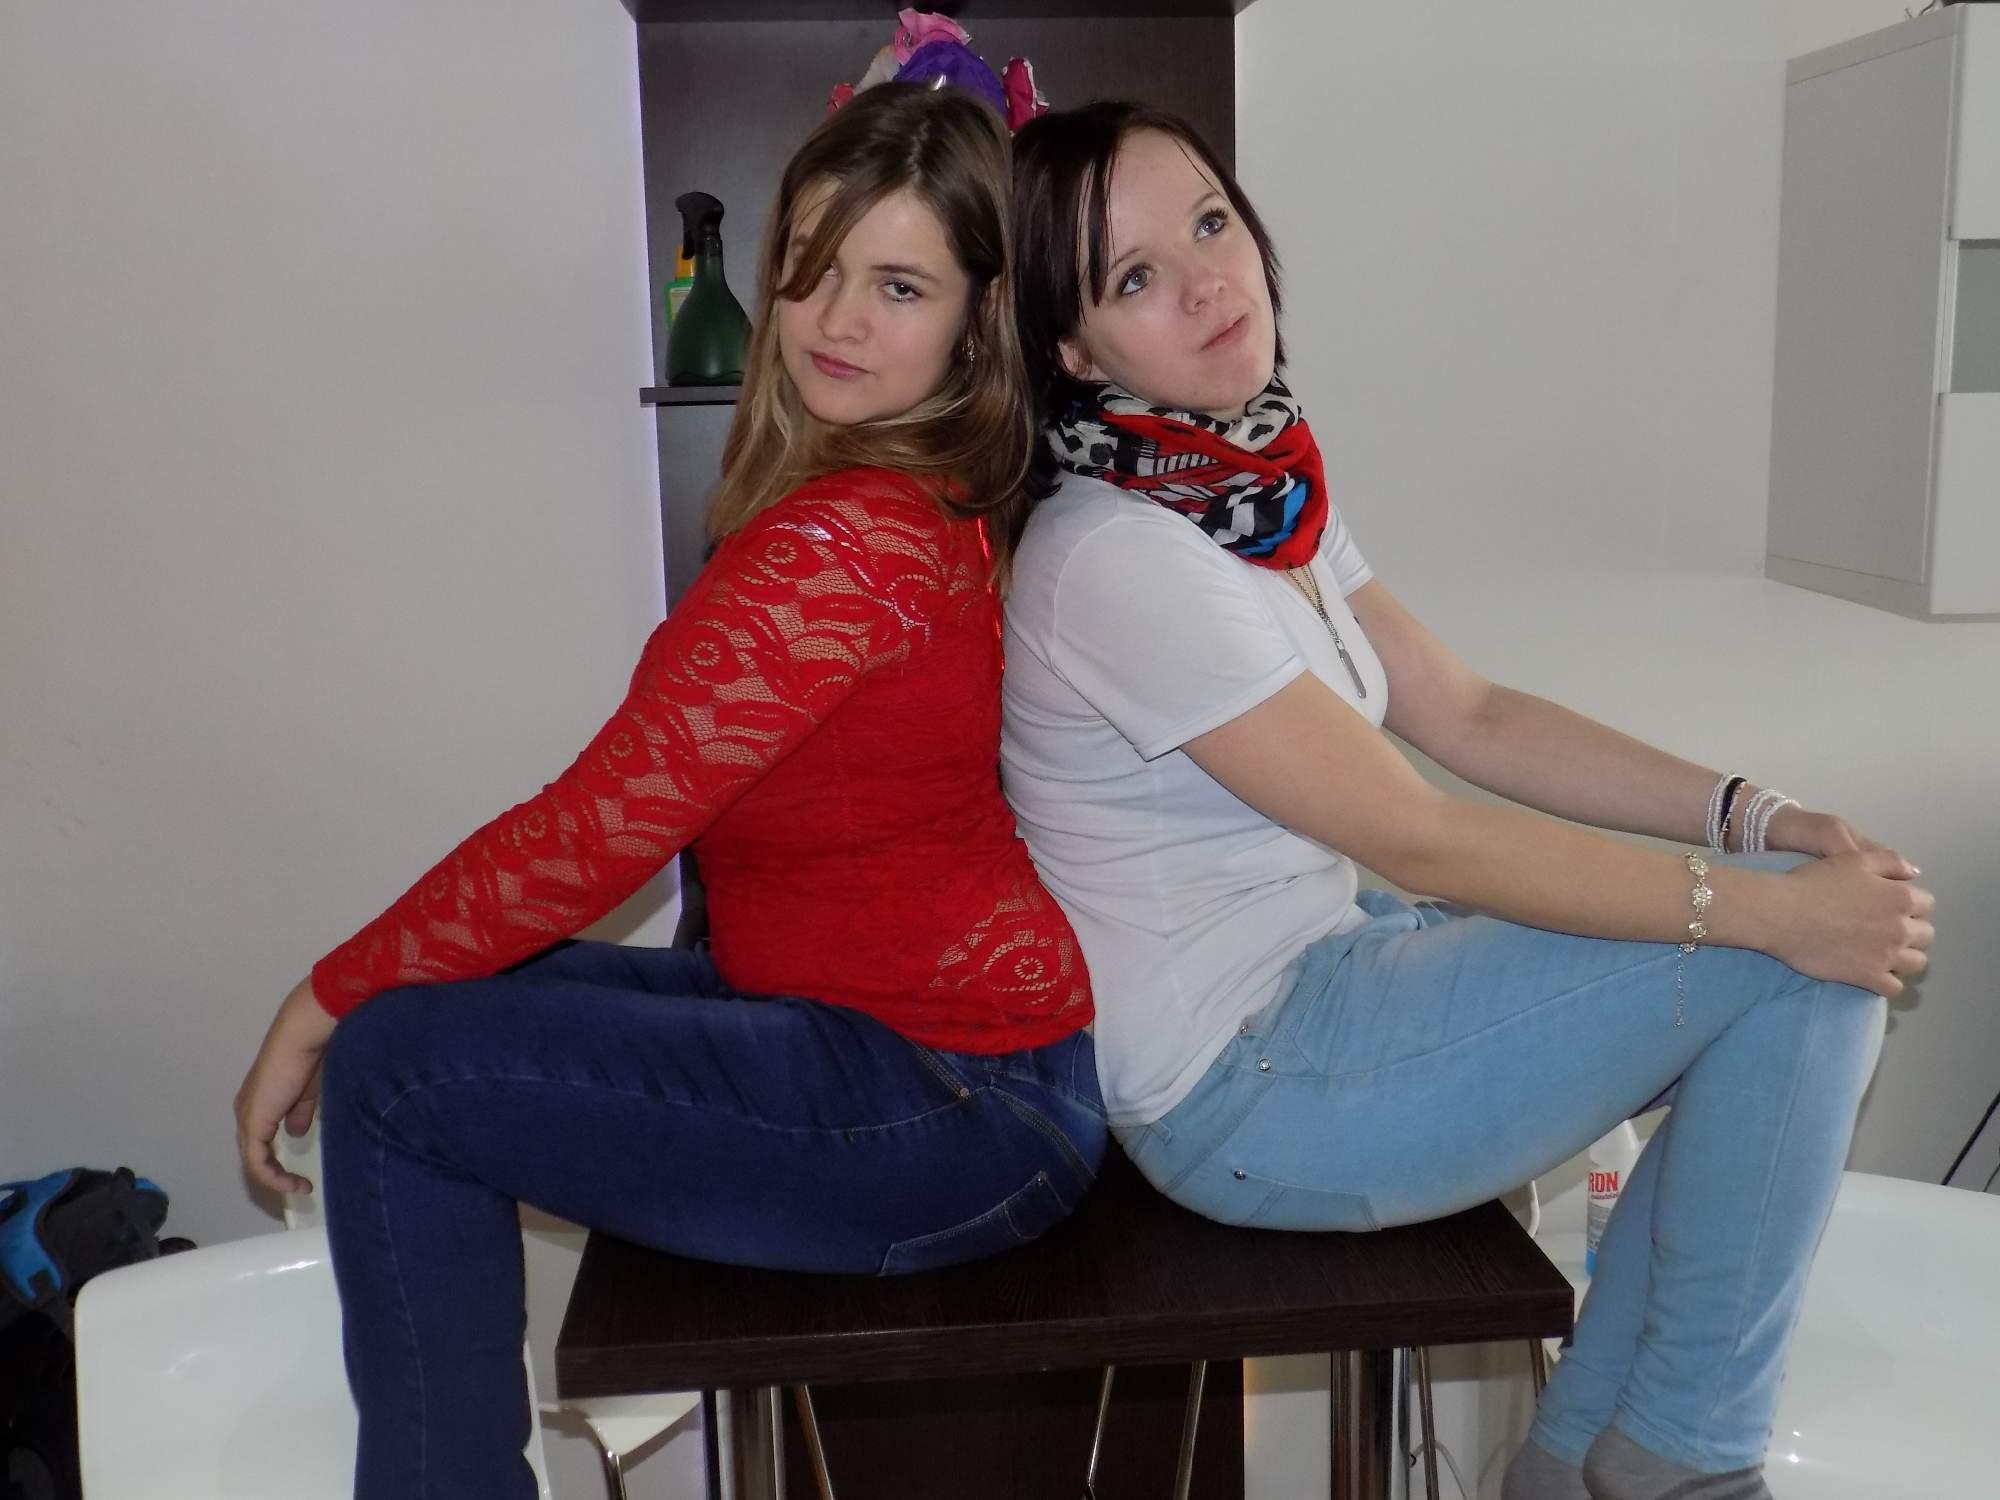 http://img25.rajce.idnes.cz/d2502/13/13862/13862137_c5559384bb63a400f5d8327efbaafba8/images/DSCN1514.jpg